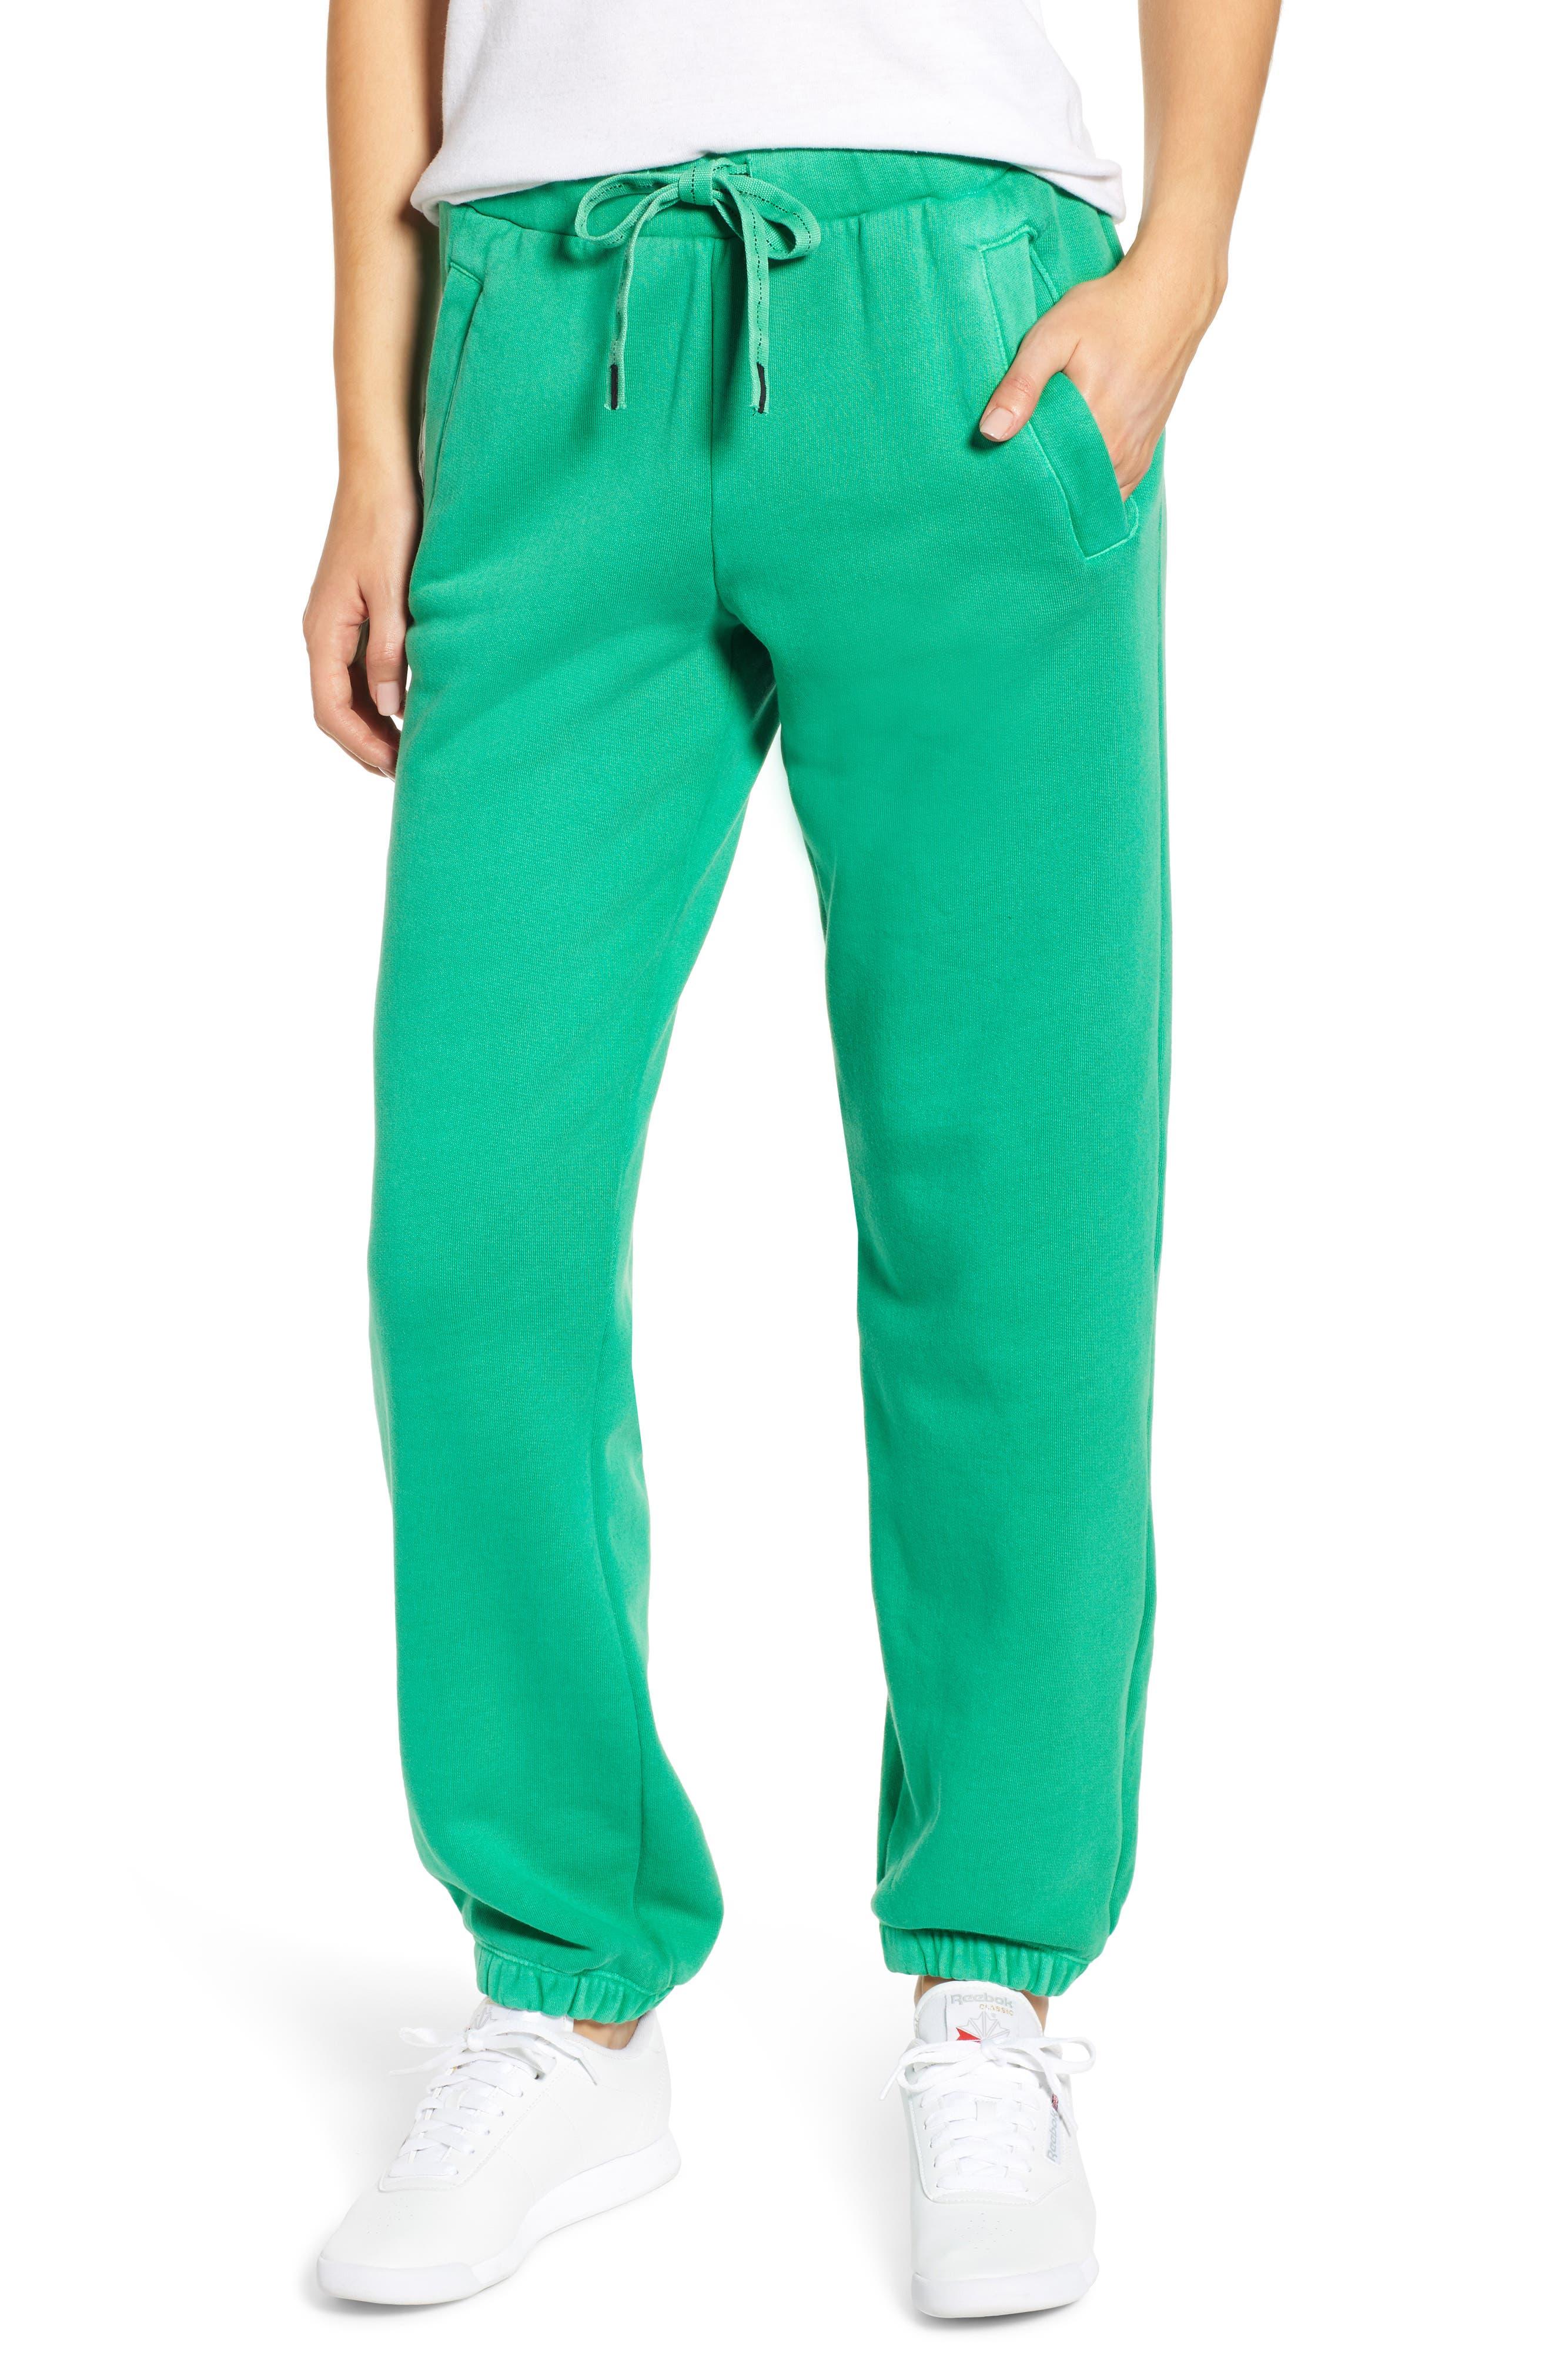 Neon Sweatpants,                             Main thumbnail 1, color,                             GREEN